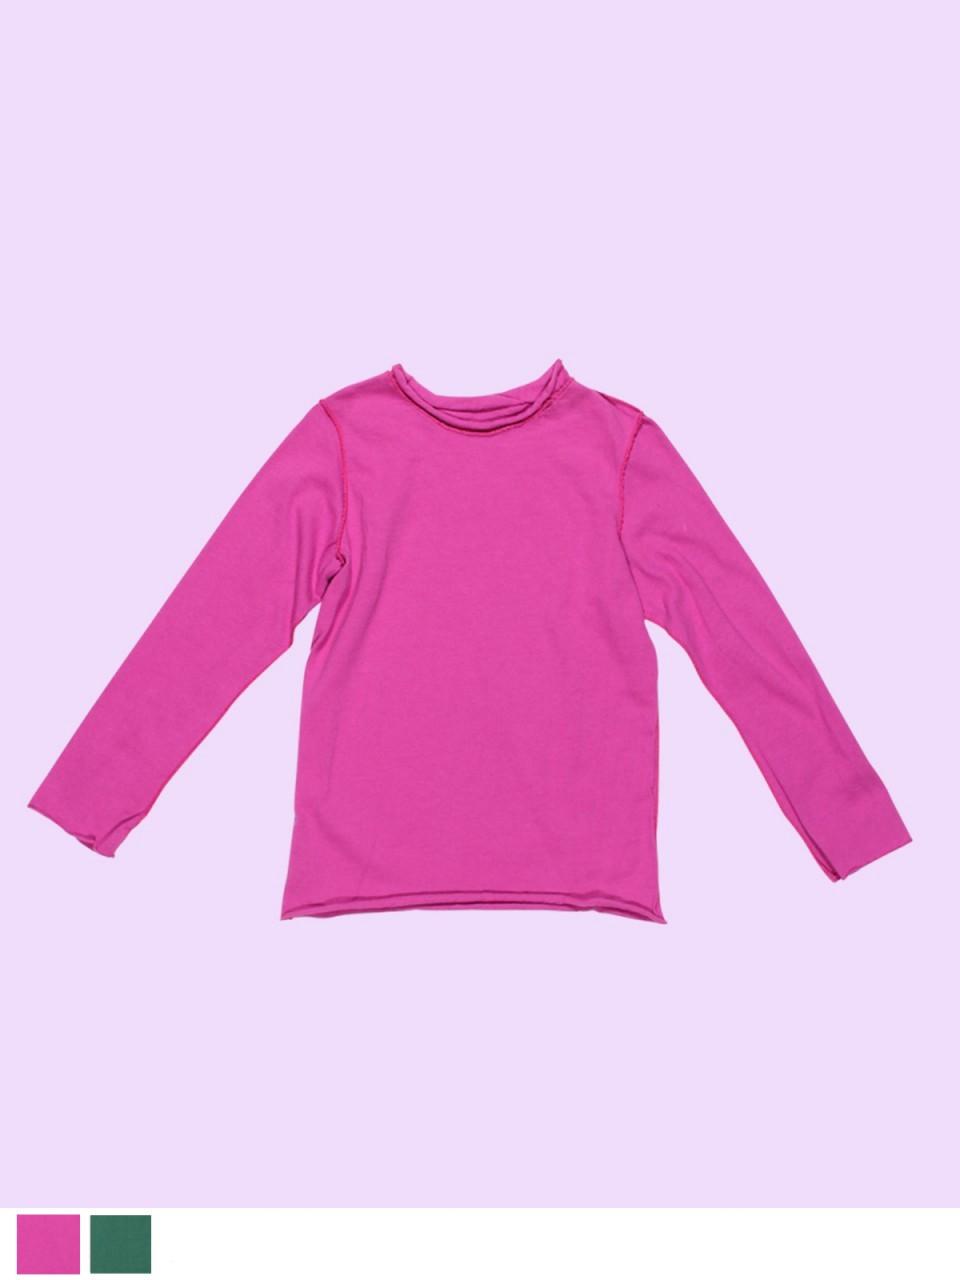 Long Sleeve Plain T-Shirt - Organic Cotton Jersey - Solne Eco Department  Store